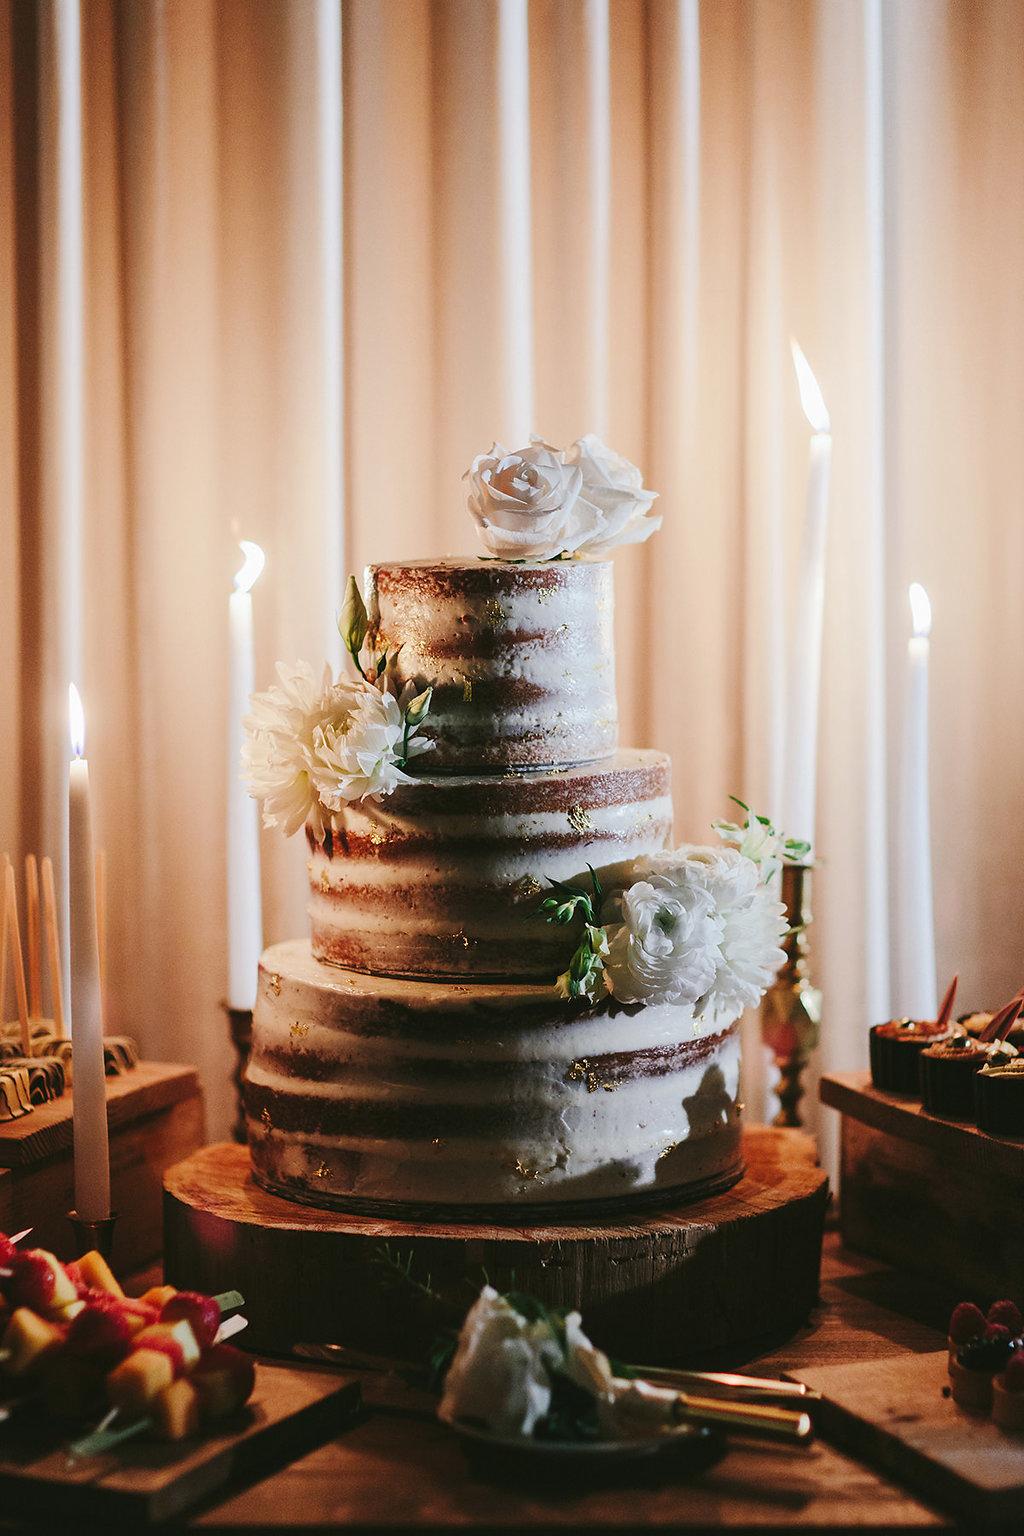 wedding cakes - photo by Melia Lucida https://ruffledblog.com/elegant-canadian-wedding-with-greenery